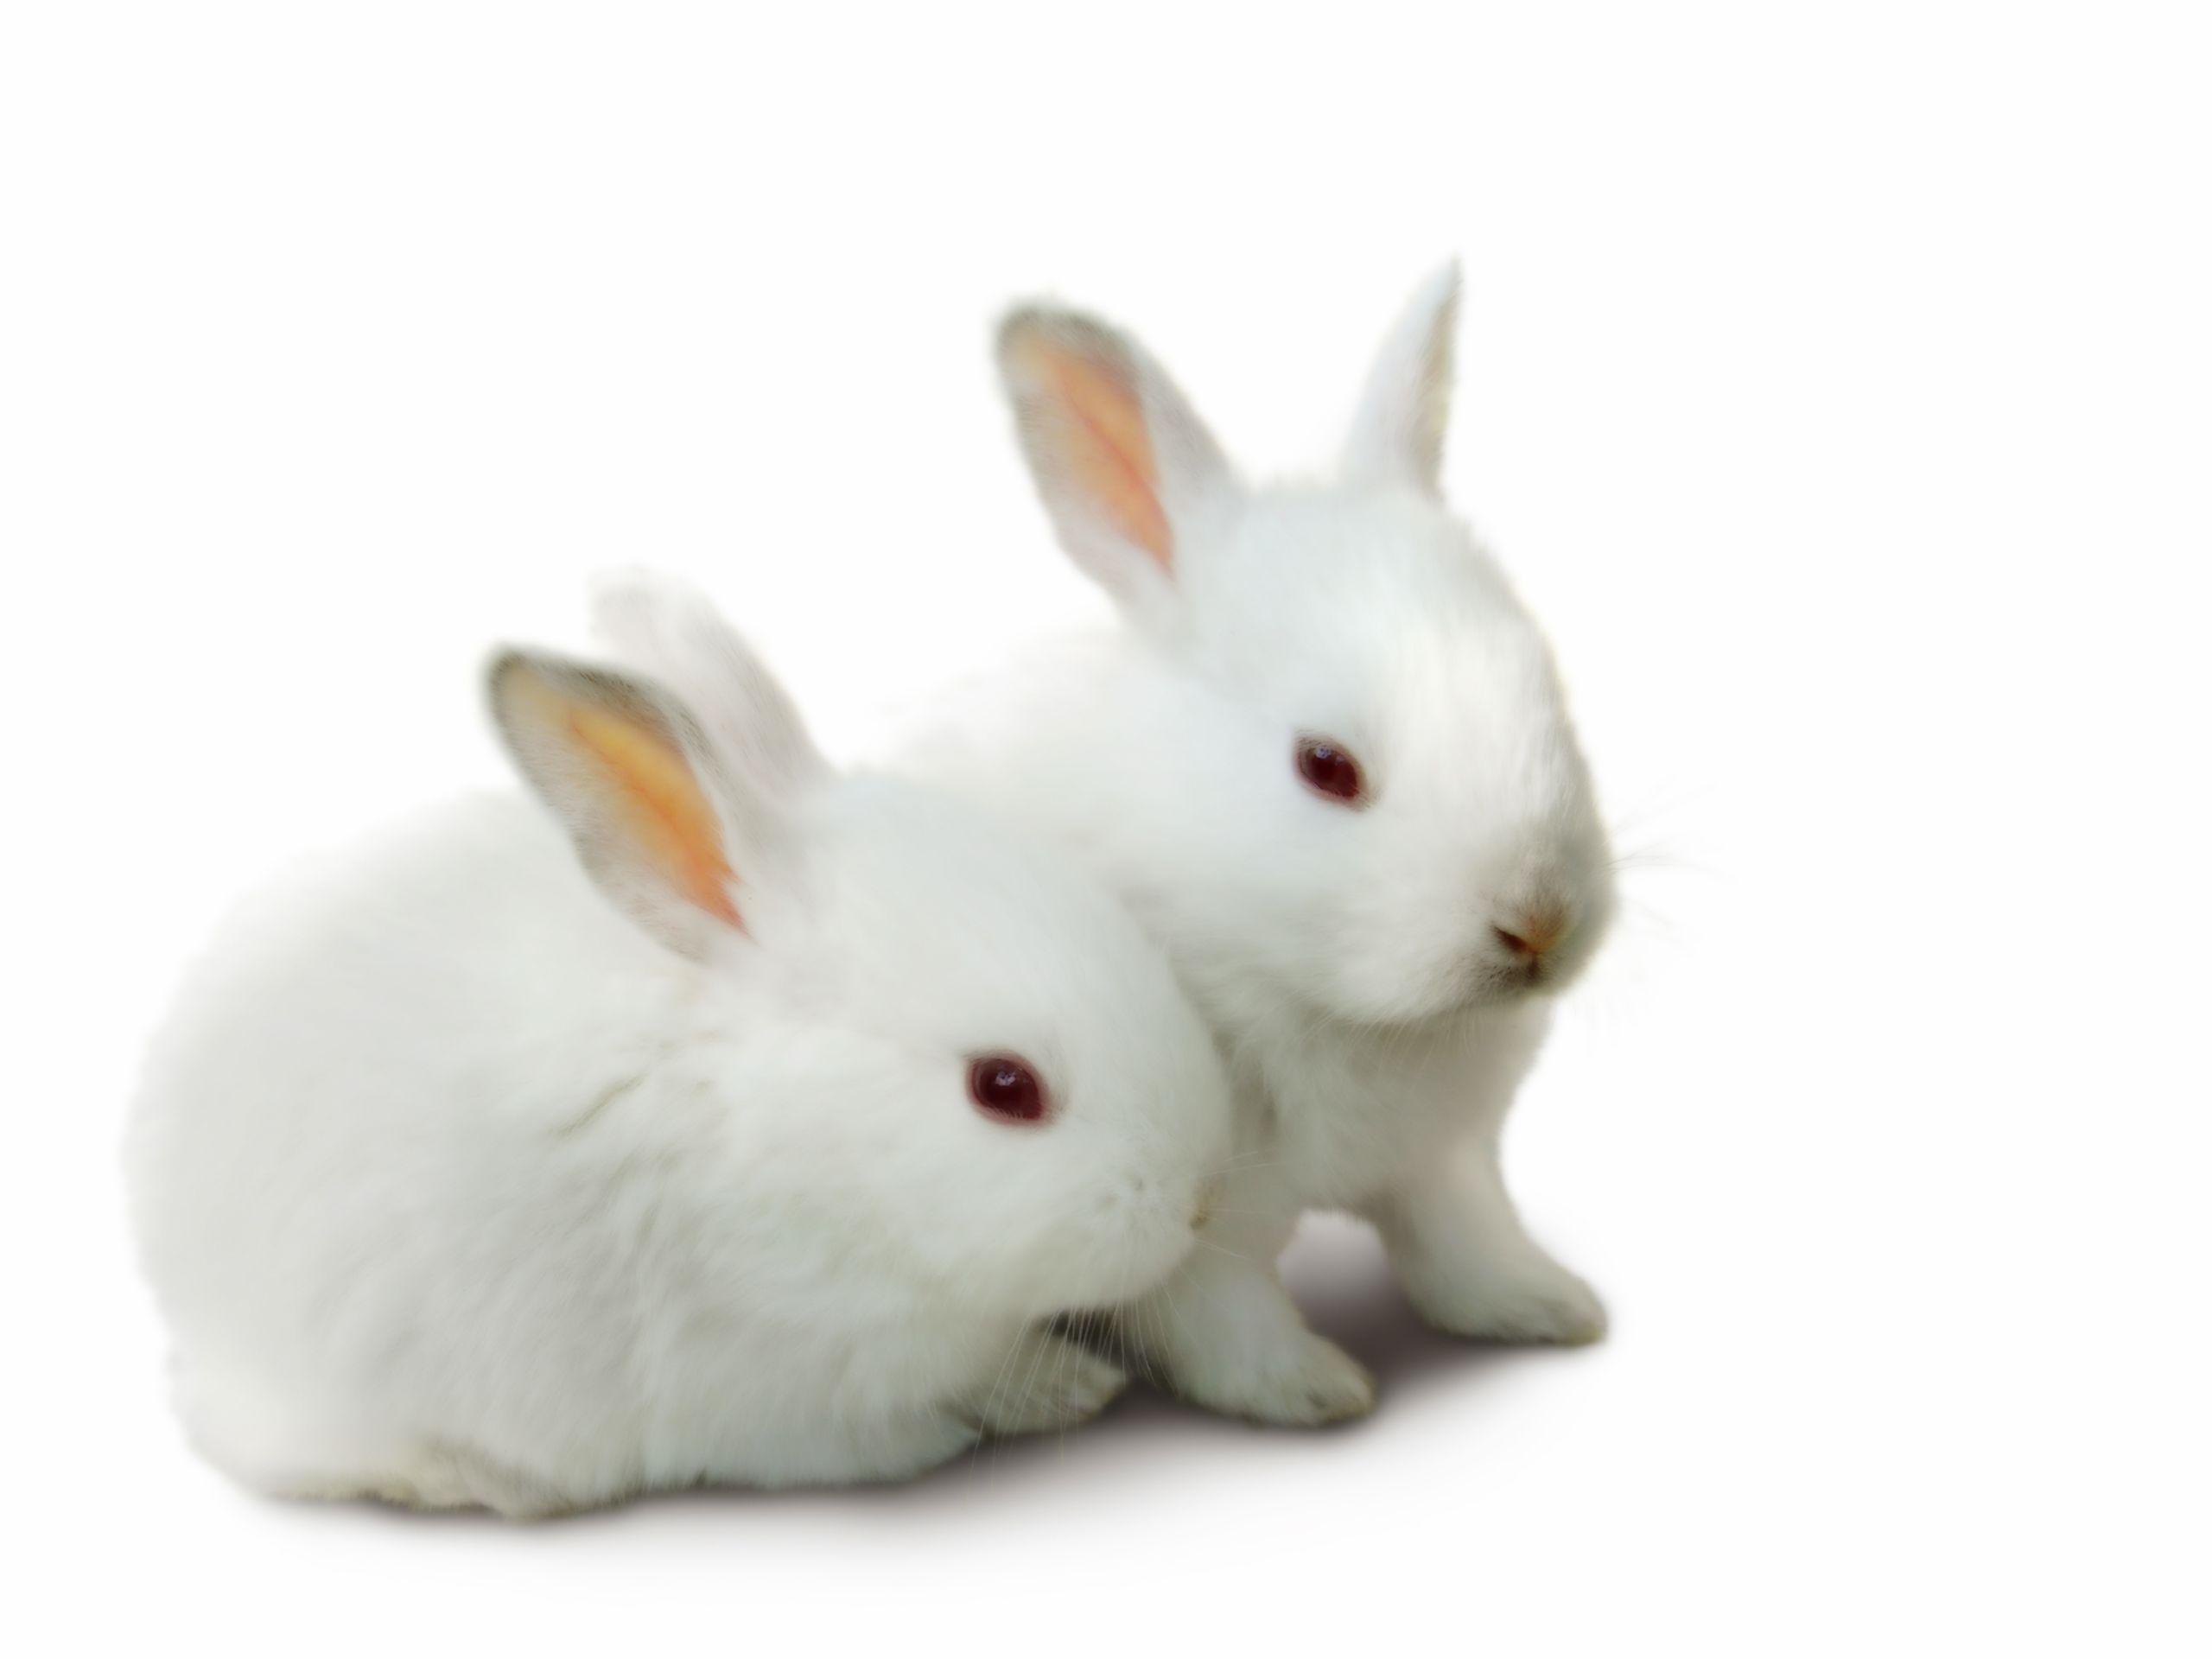 cute rabbit hd beautiful wallpapers picture free for desktop hd